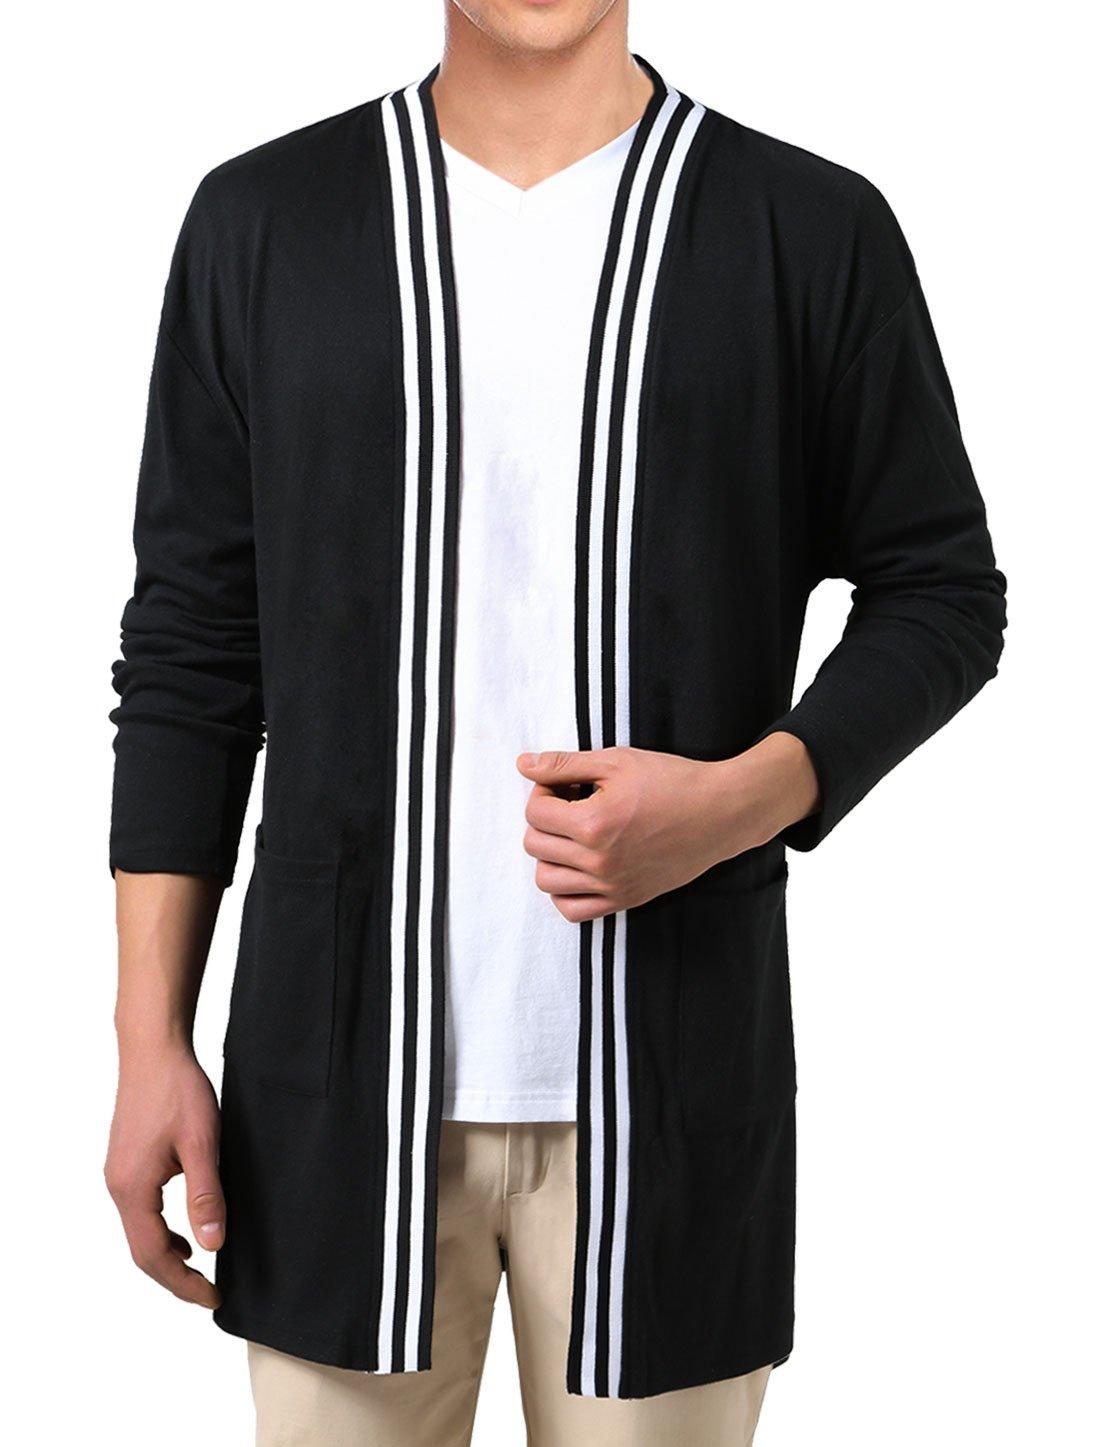 uxcell Men Shawl Collar Open Front Pockets Stripes Pattern Hem Cardigan L Black